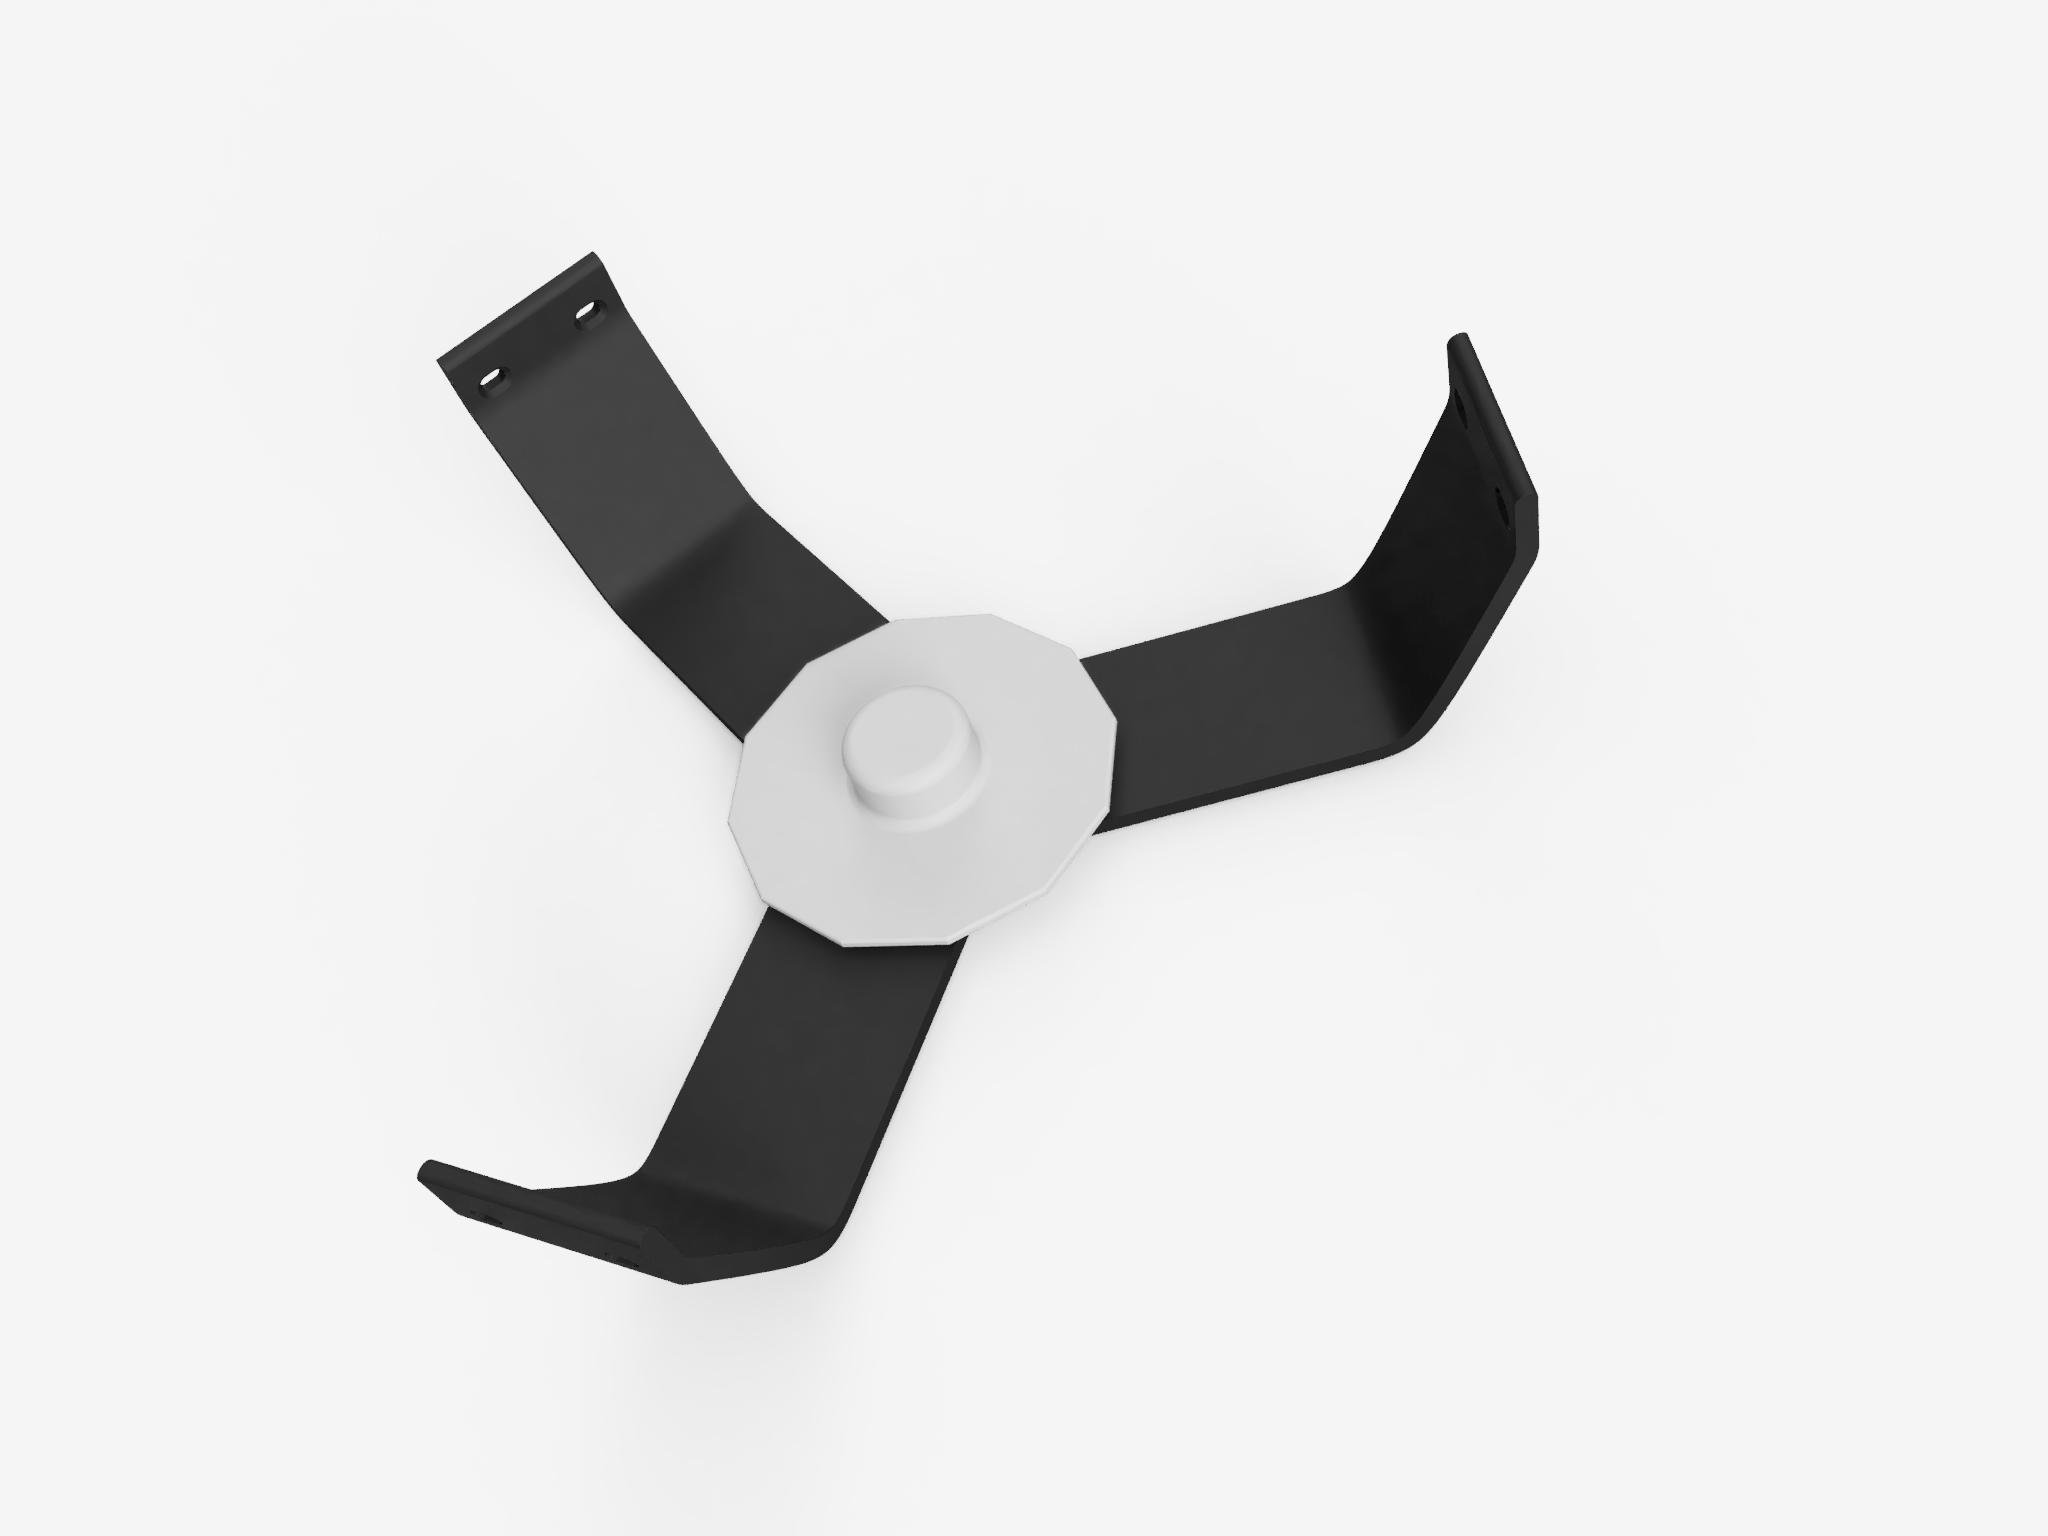 1.png Download free STL file Anycubic Kossel 608 Bearing Top Spool Holder • 3D printable model, VICLER